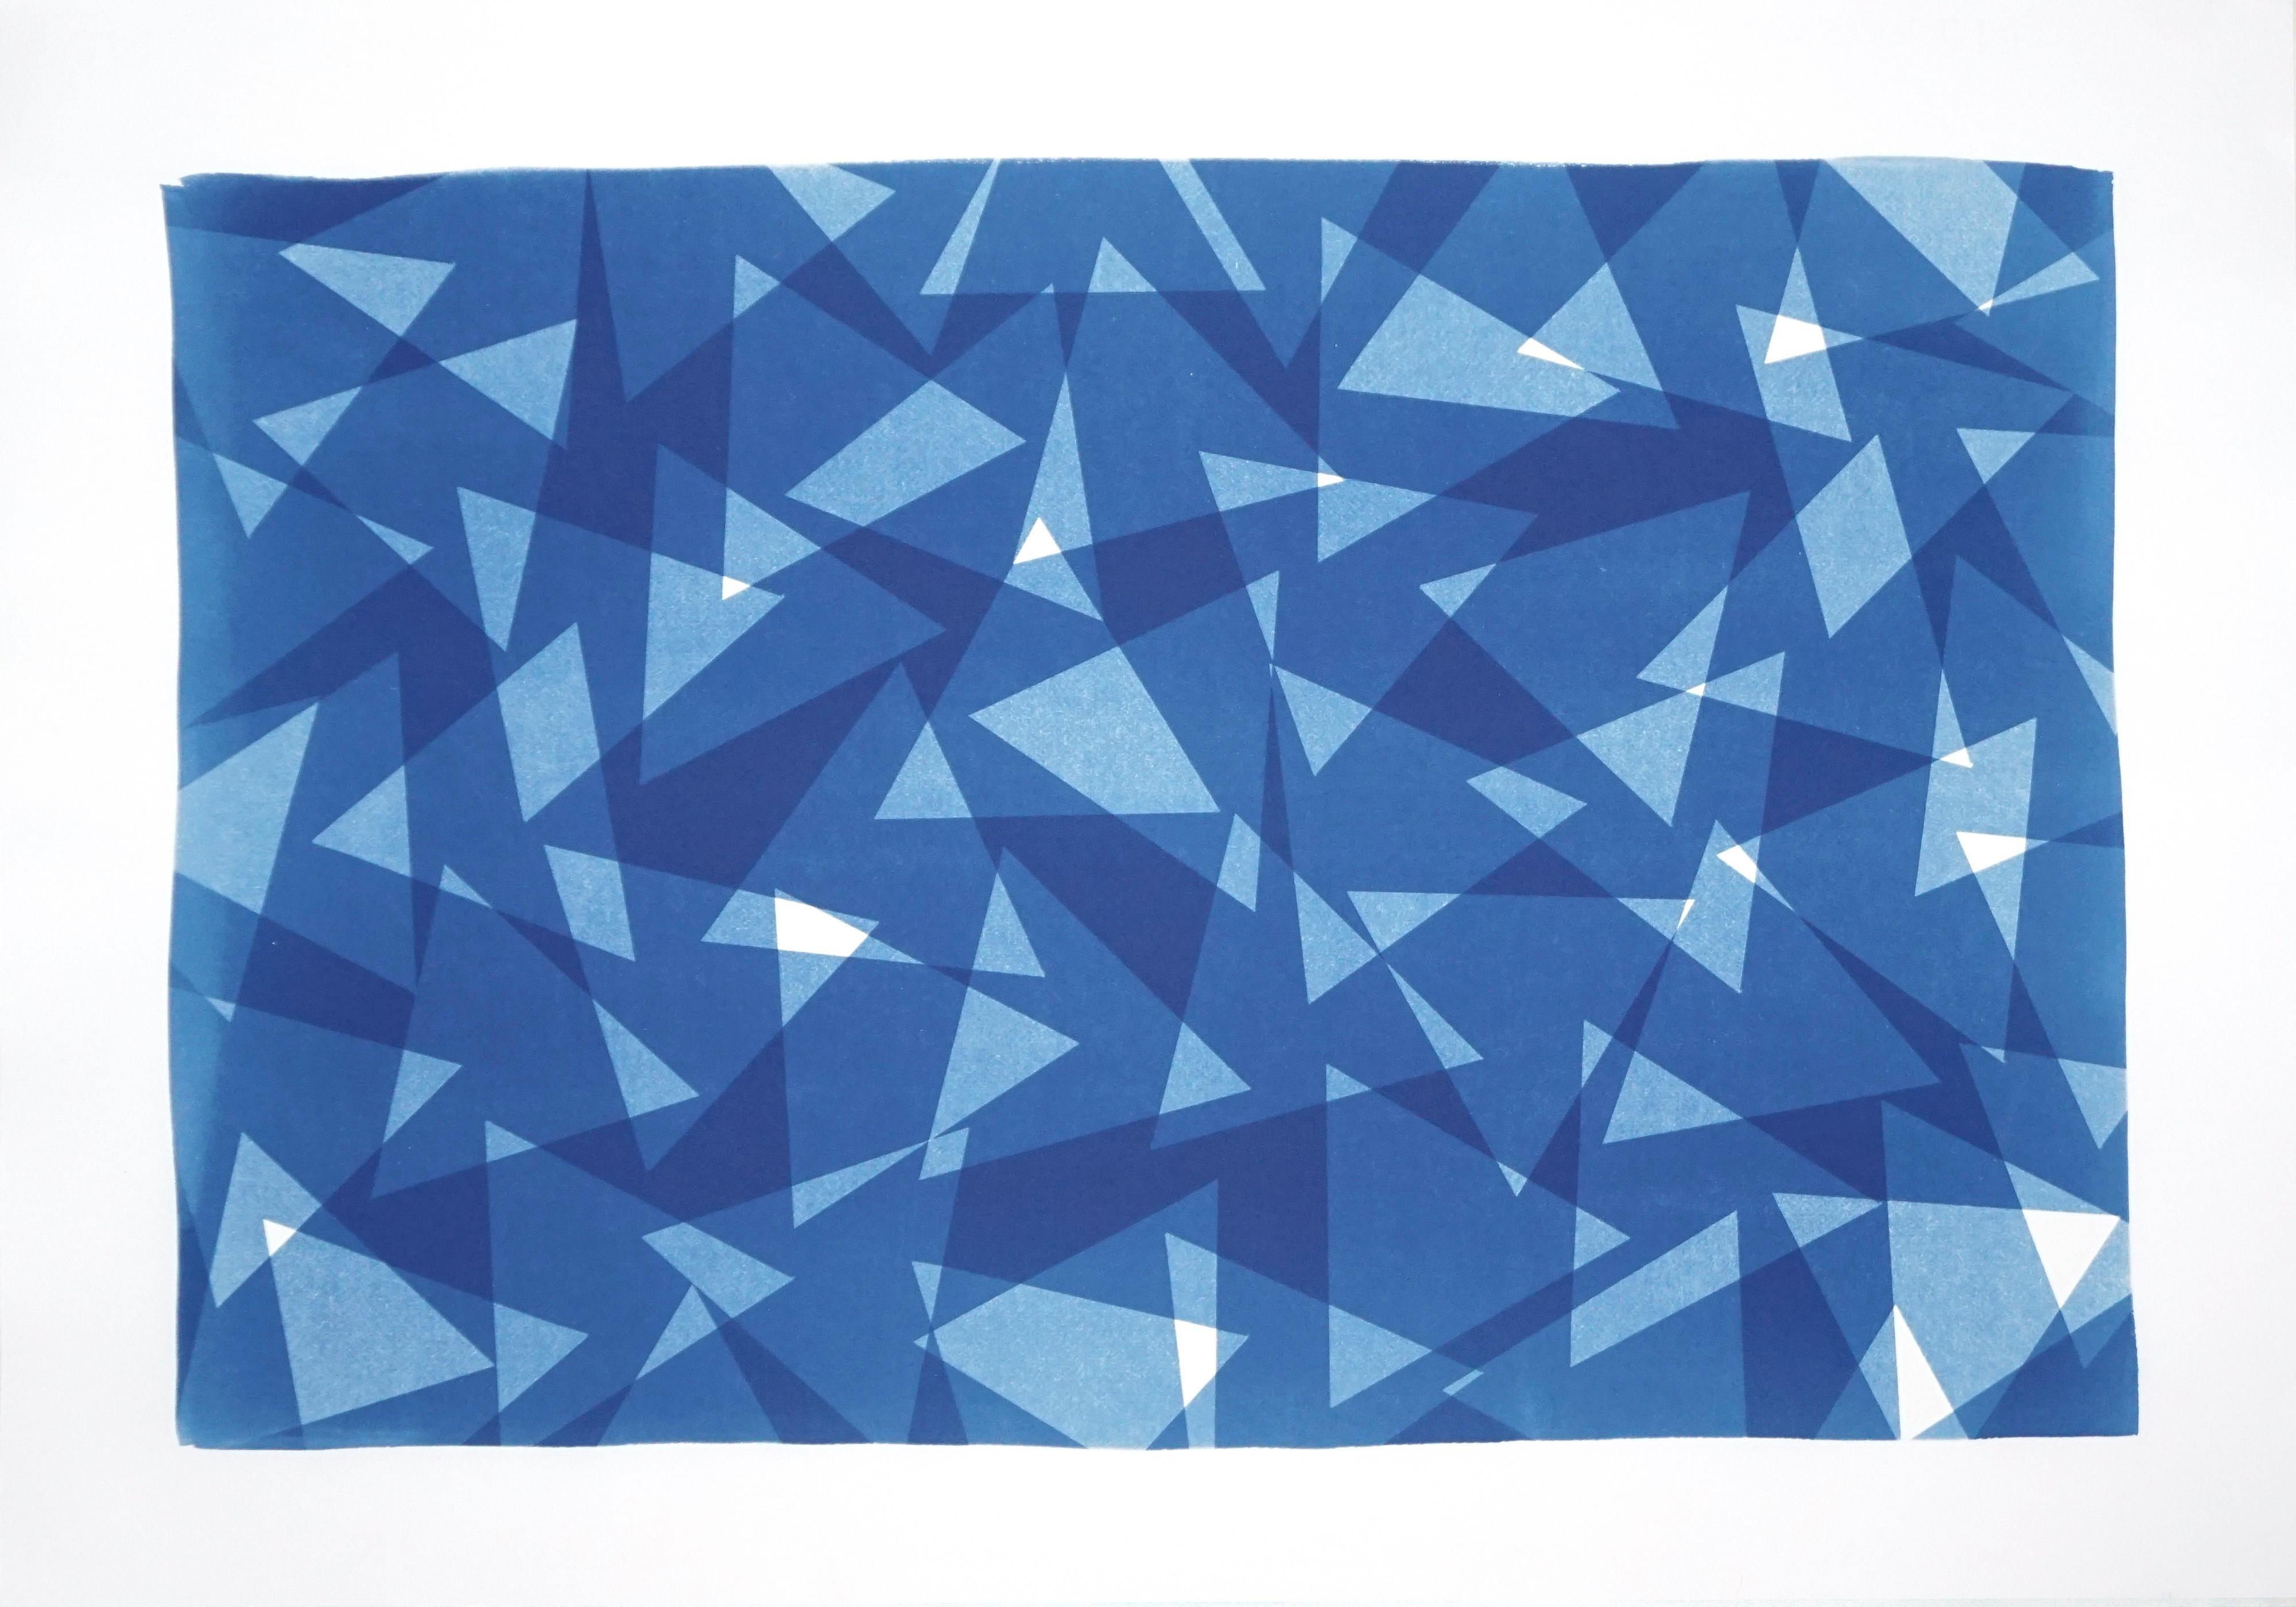 Geometric Triangles Pattern Print, Cutout Layer Paper Cyanotype in Blue Tones